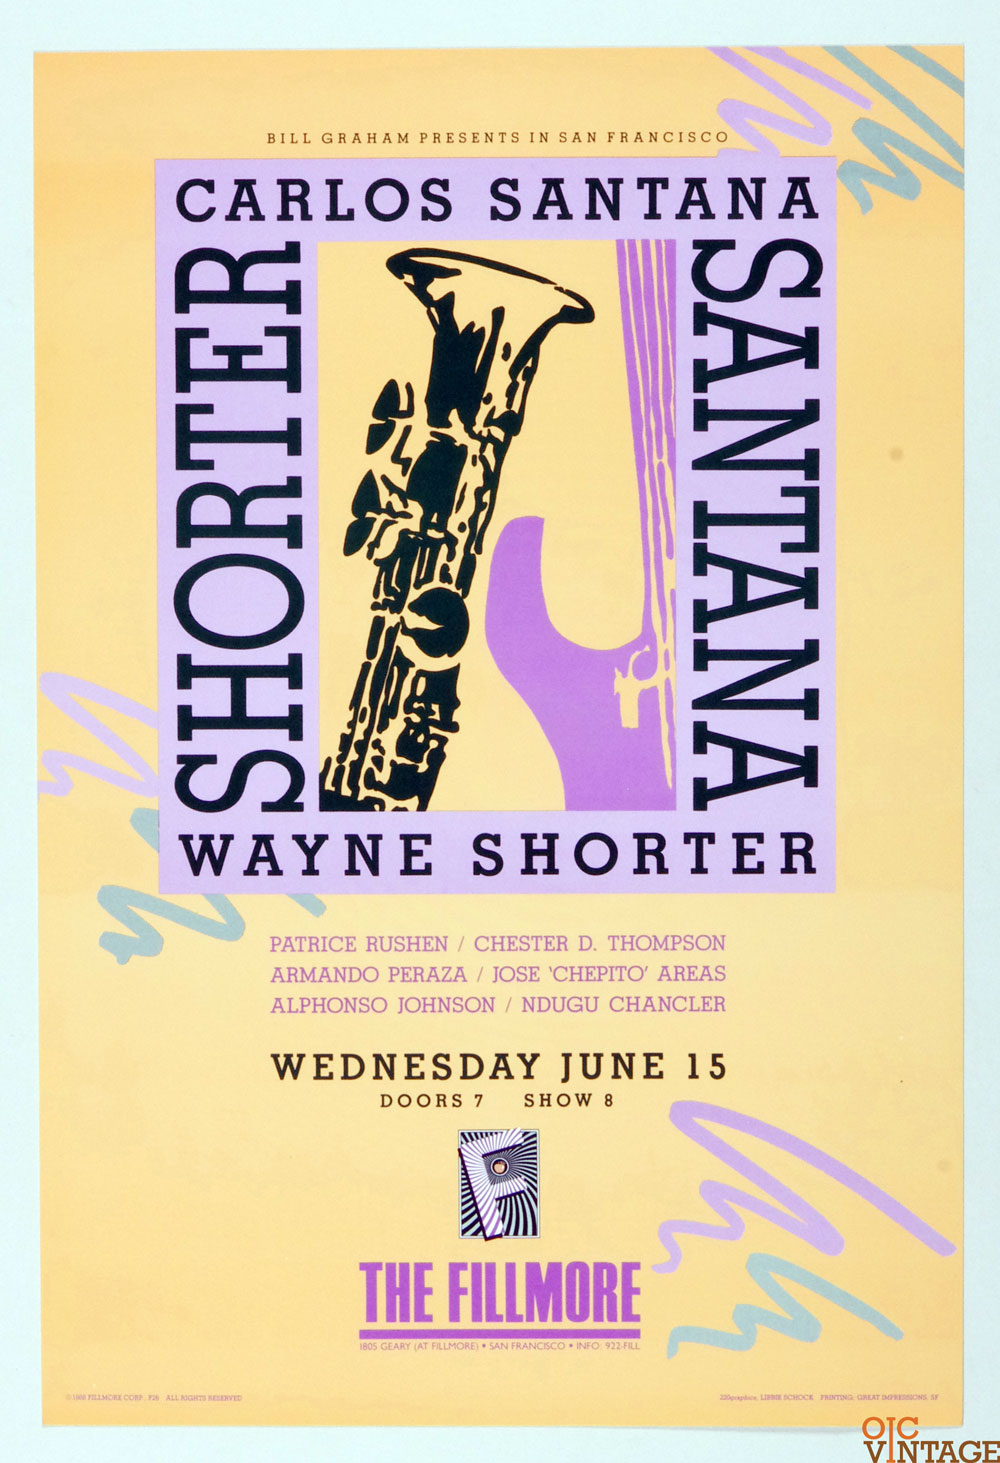 Santana Poster 1988 Jun 15 New Fillmore